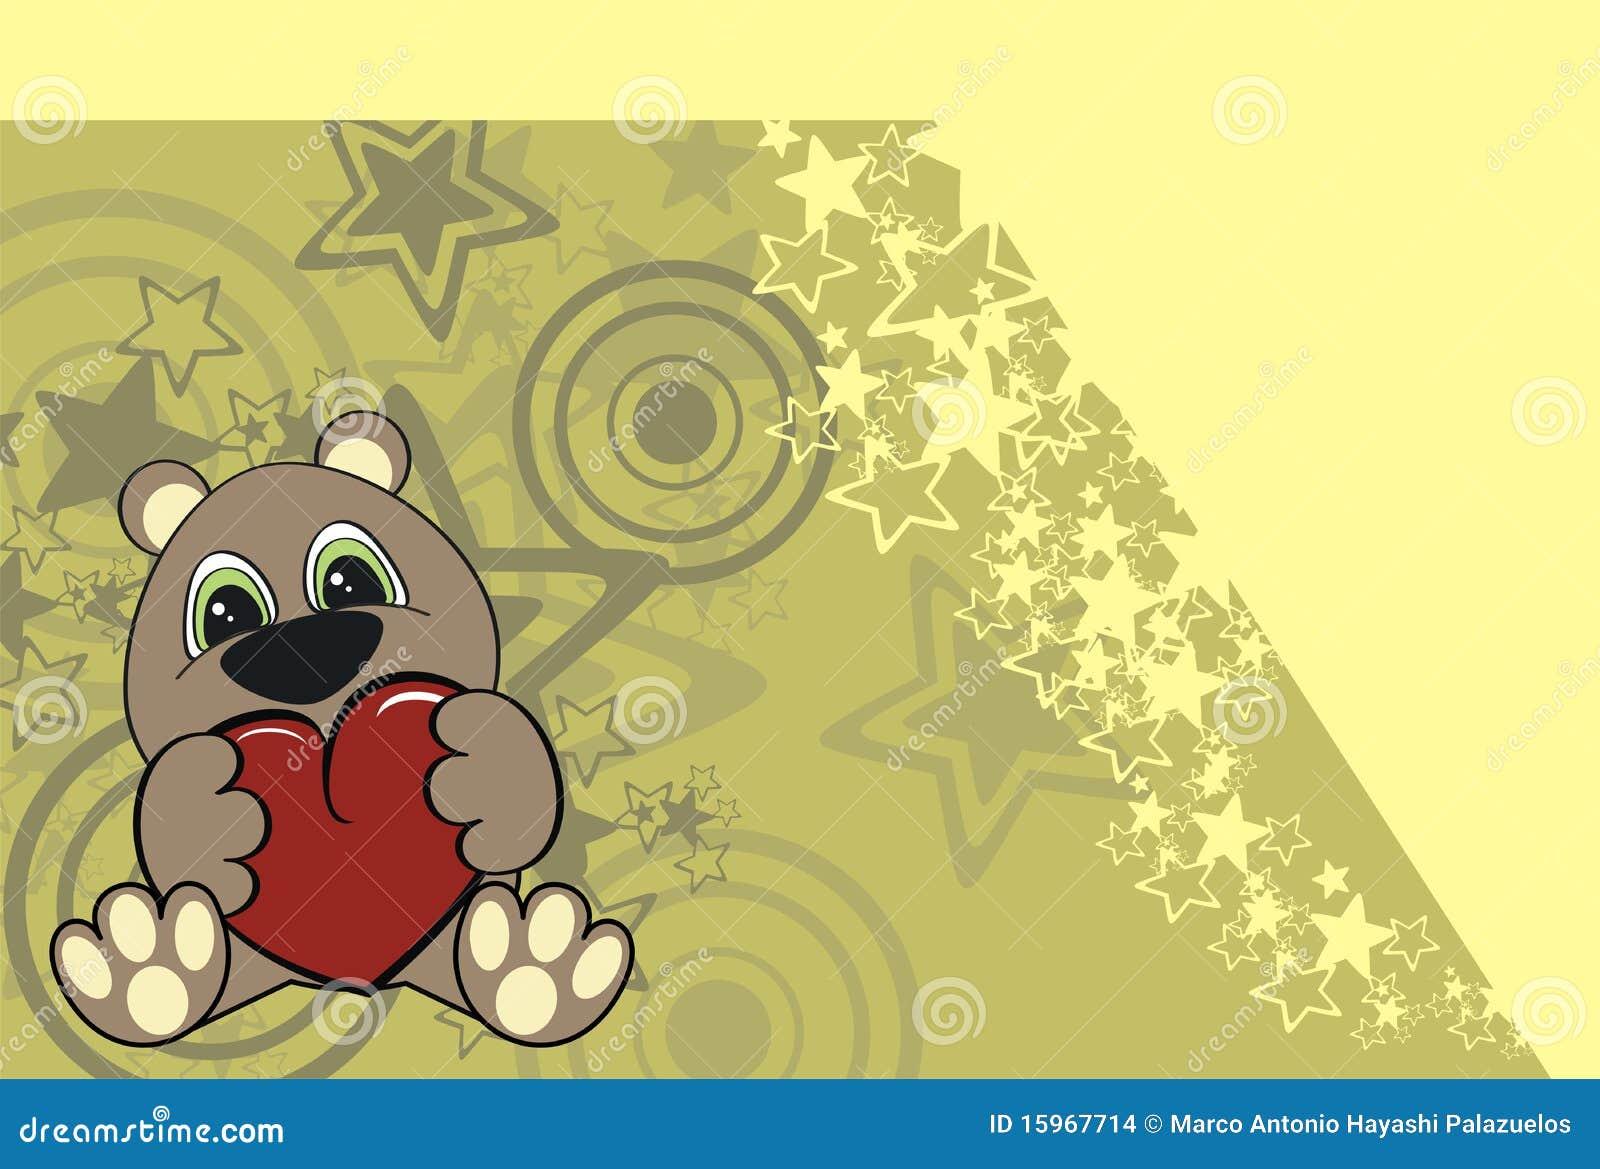 Teddy bear cartoon valentine background